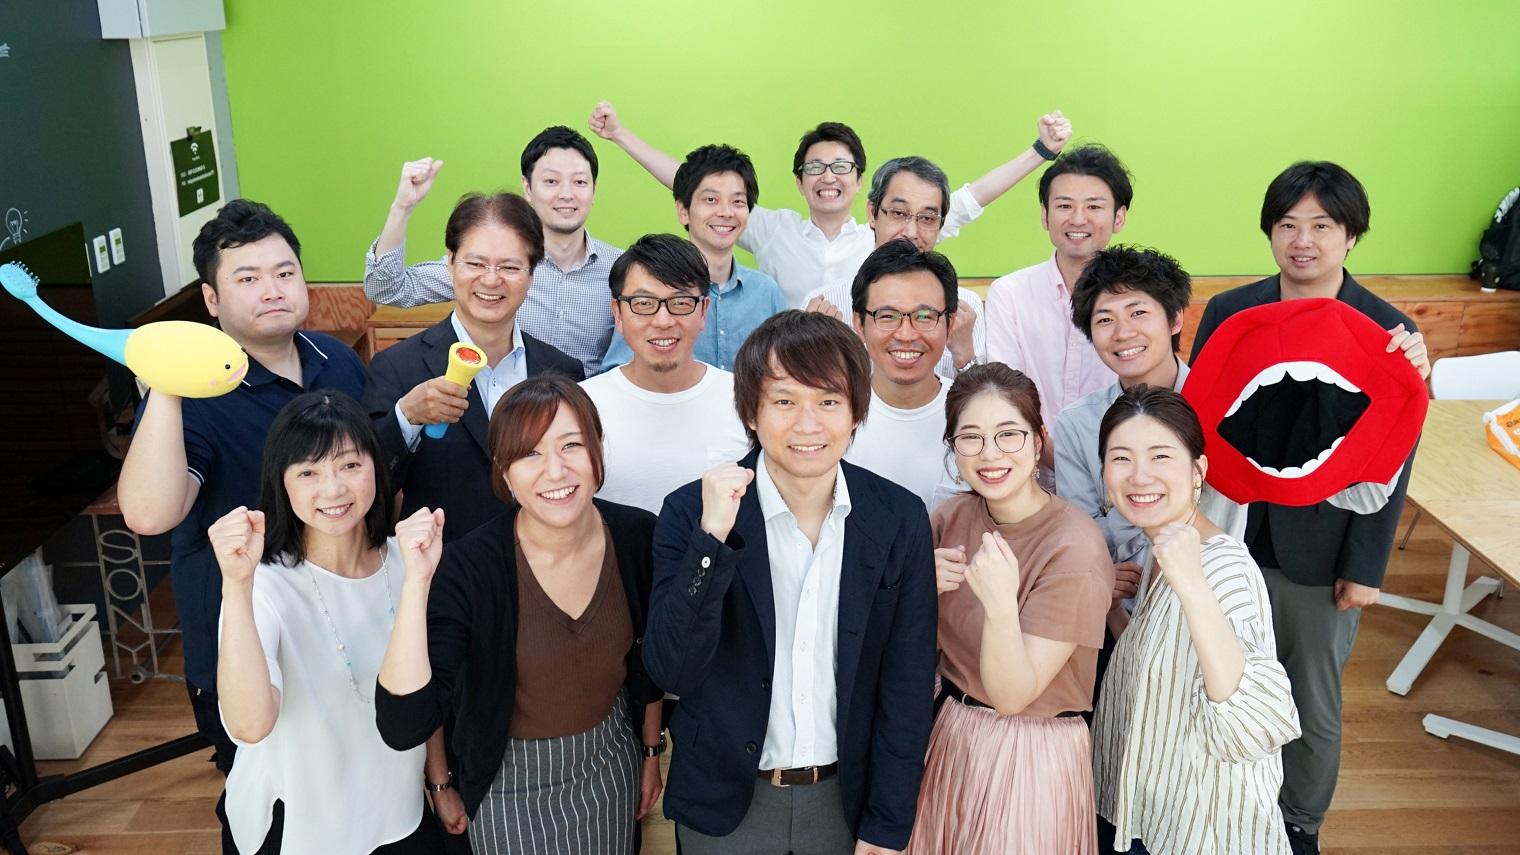 Possiプロジェクトに関わった京セラ株式会社・ライオン株式会社・ソニーのメンバー